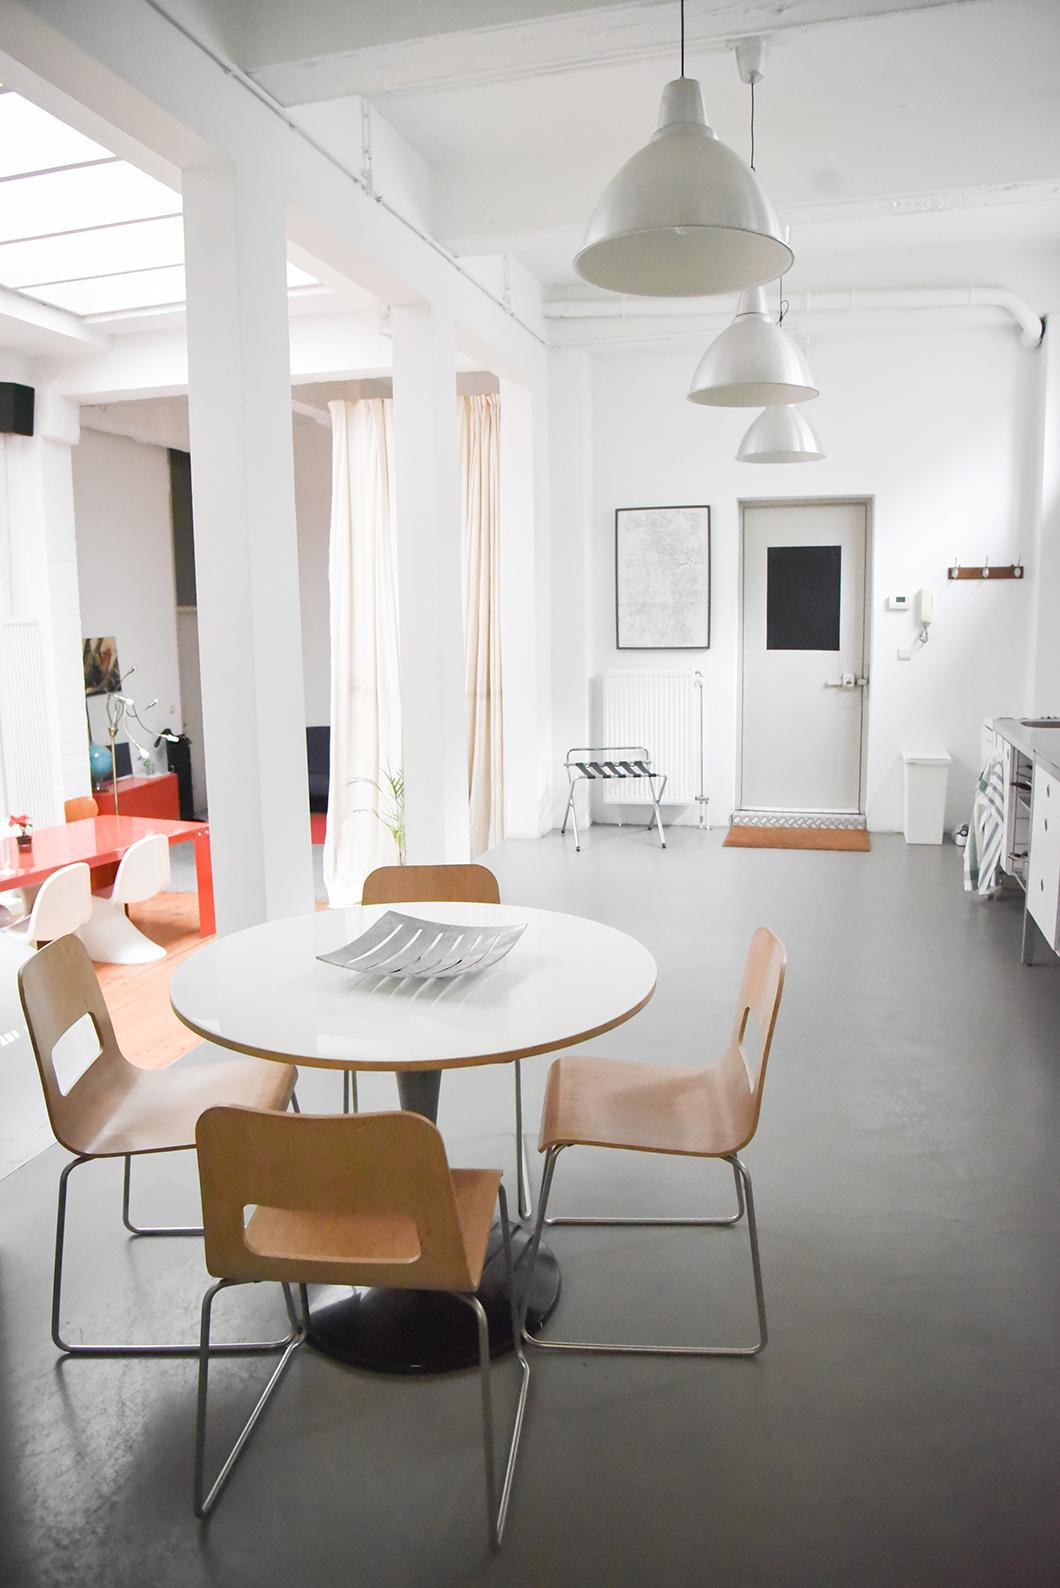 Où dormir lors d'un week end à Bruxelles ? Notre airbnb